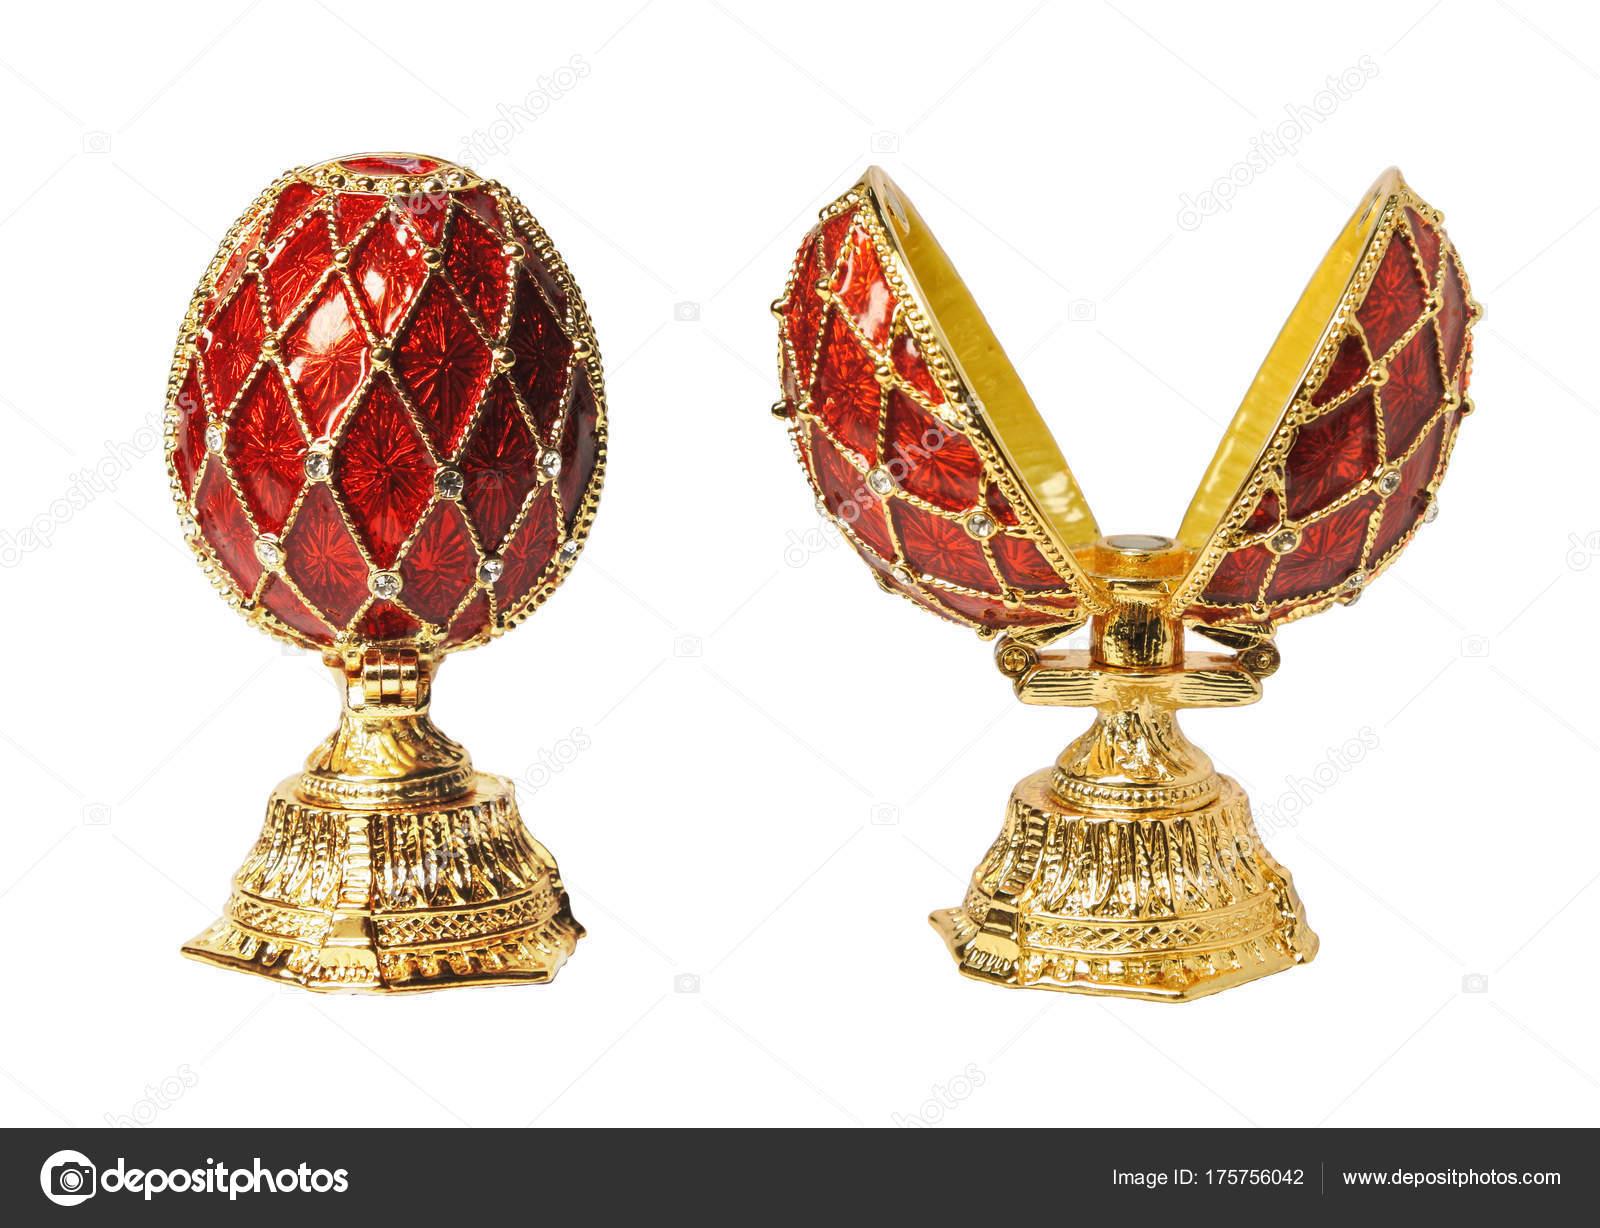 0907d2c52d Copie Cercueil Oeuf Fabergé — Photographie Myskina6 © #175756042